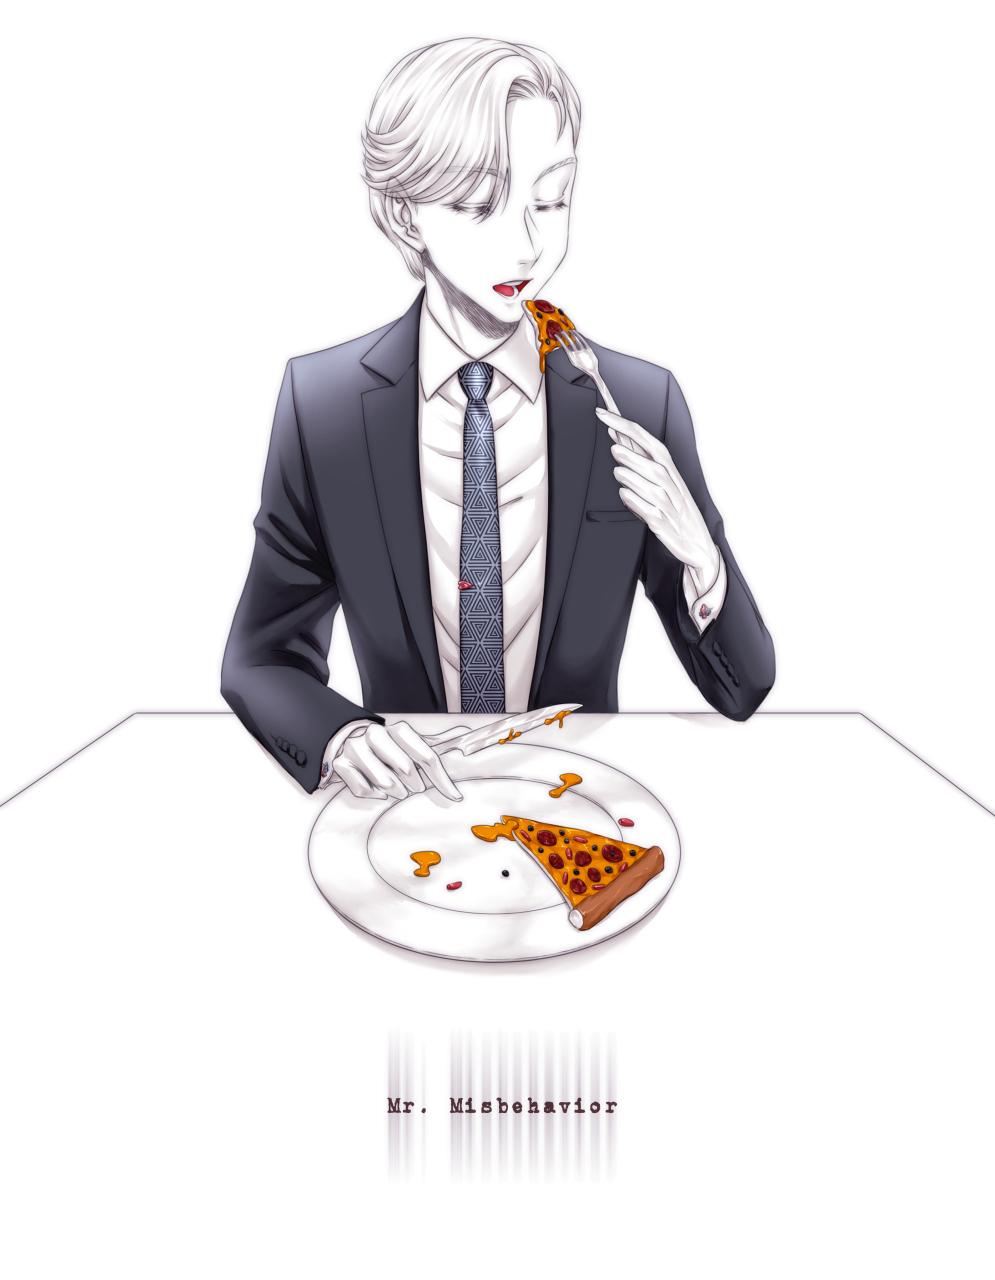 Mr. Misbehavior: Yummy